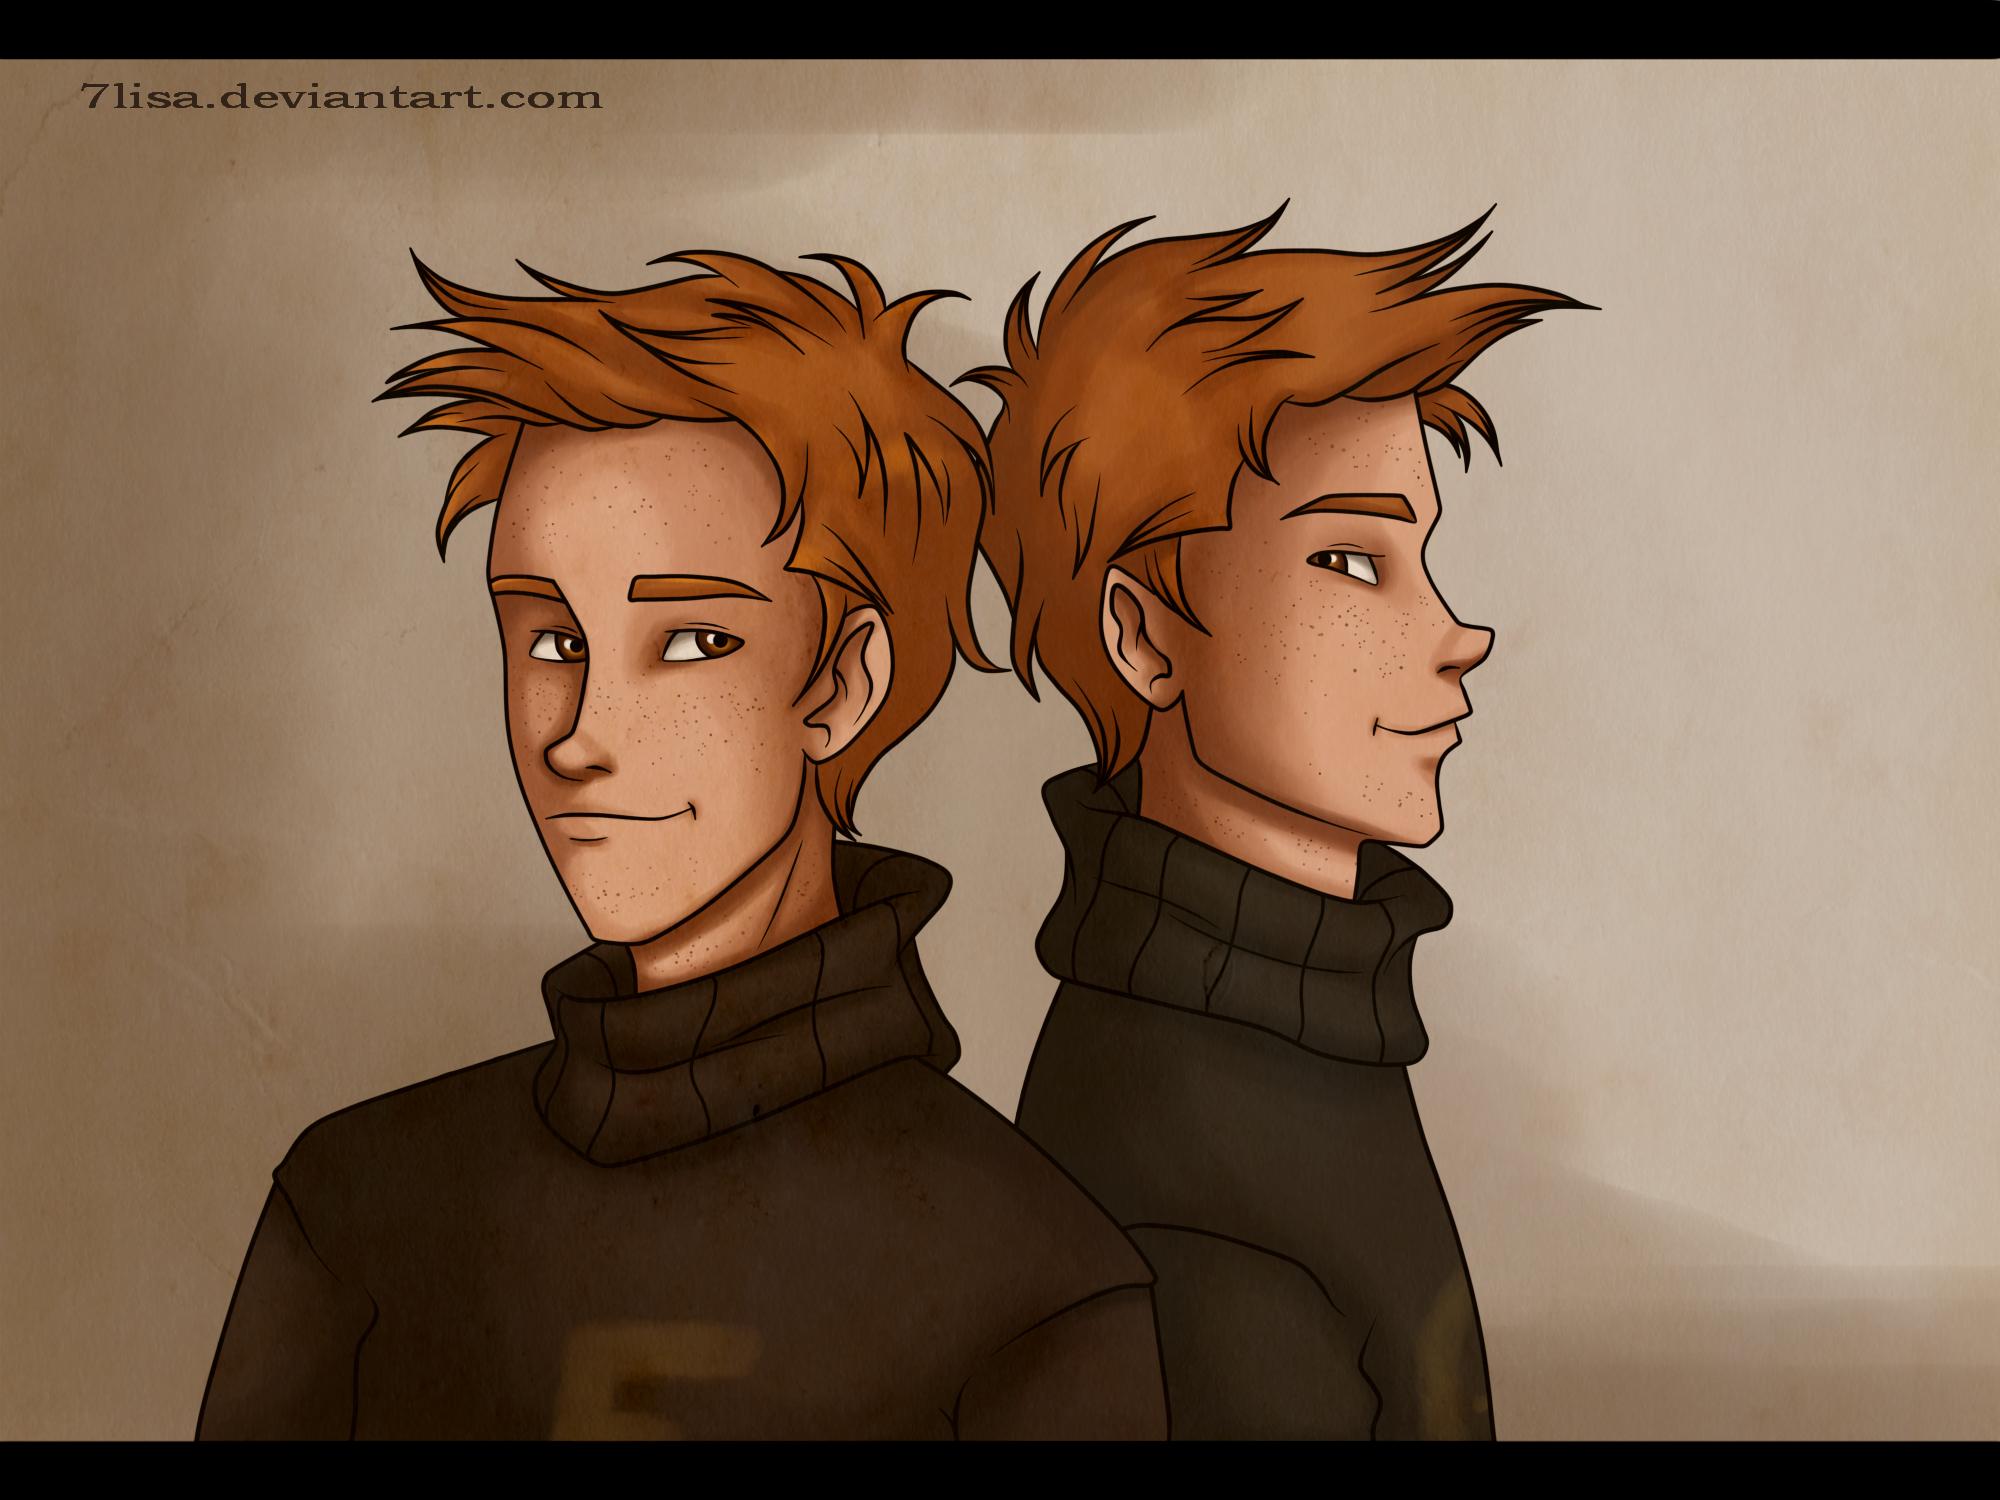 Weasley twins by 7Lisa